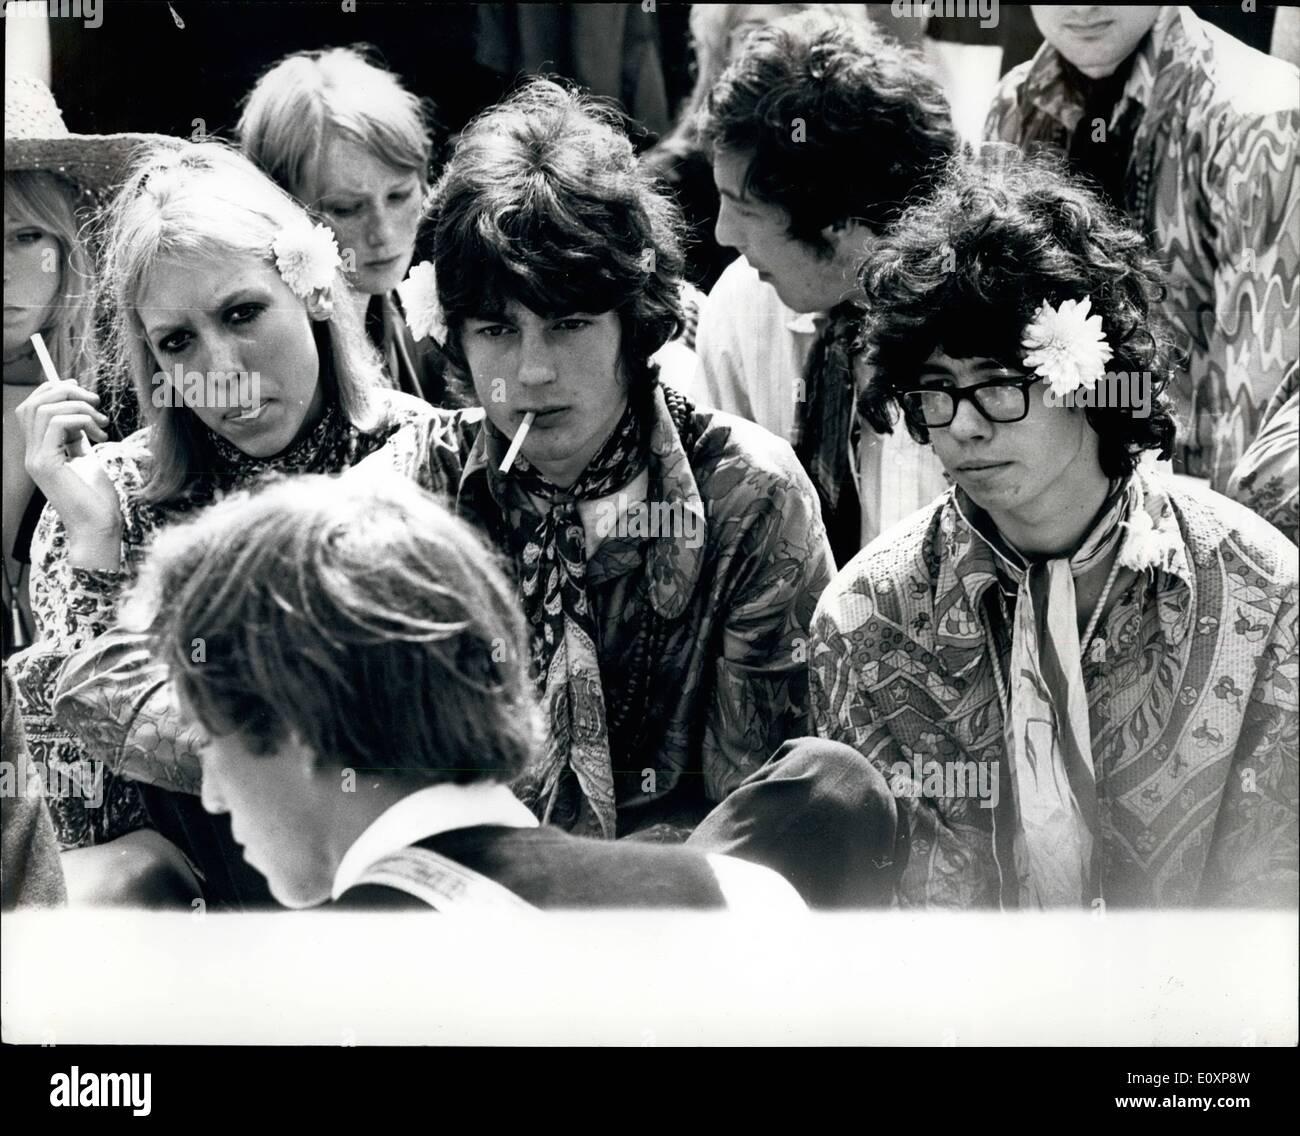 24e9674b1e36 1967 Hippies Immagini   1967 Hippies Fotos Stock - Alamy